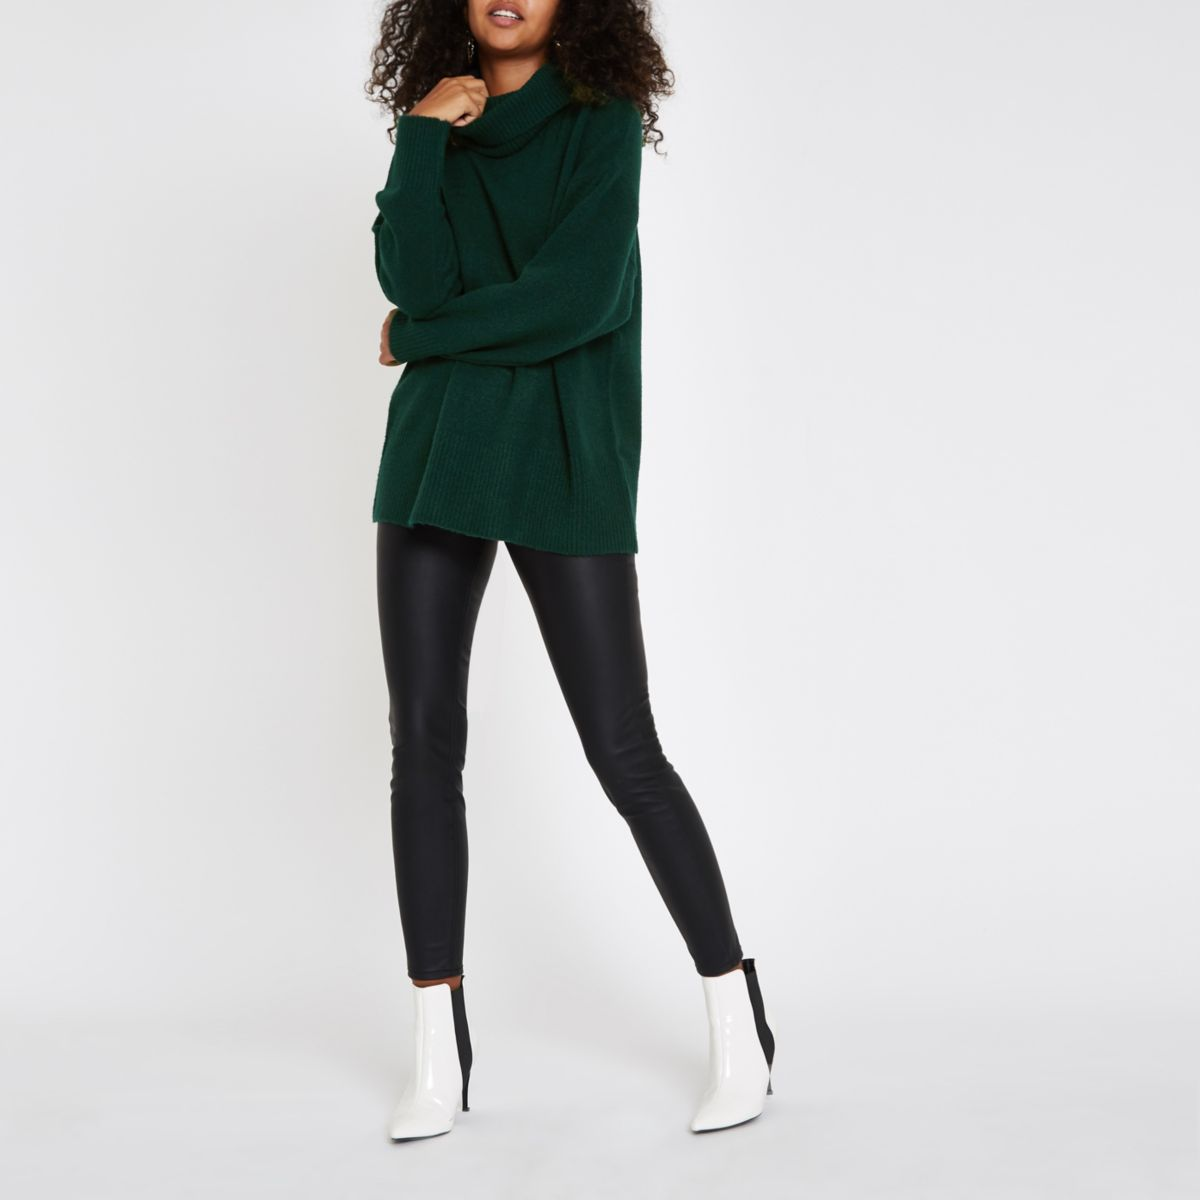 Dark green oversized roll neck sweater